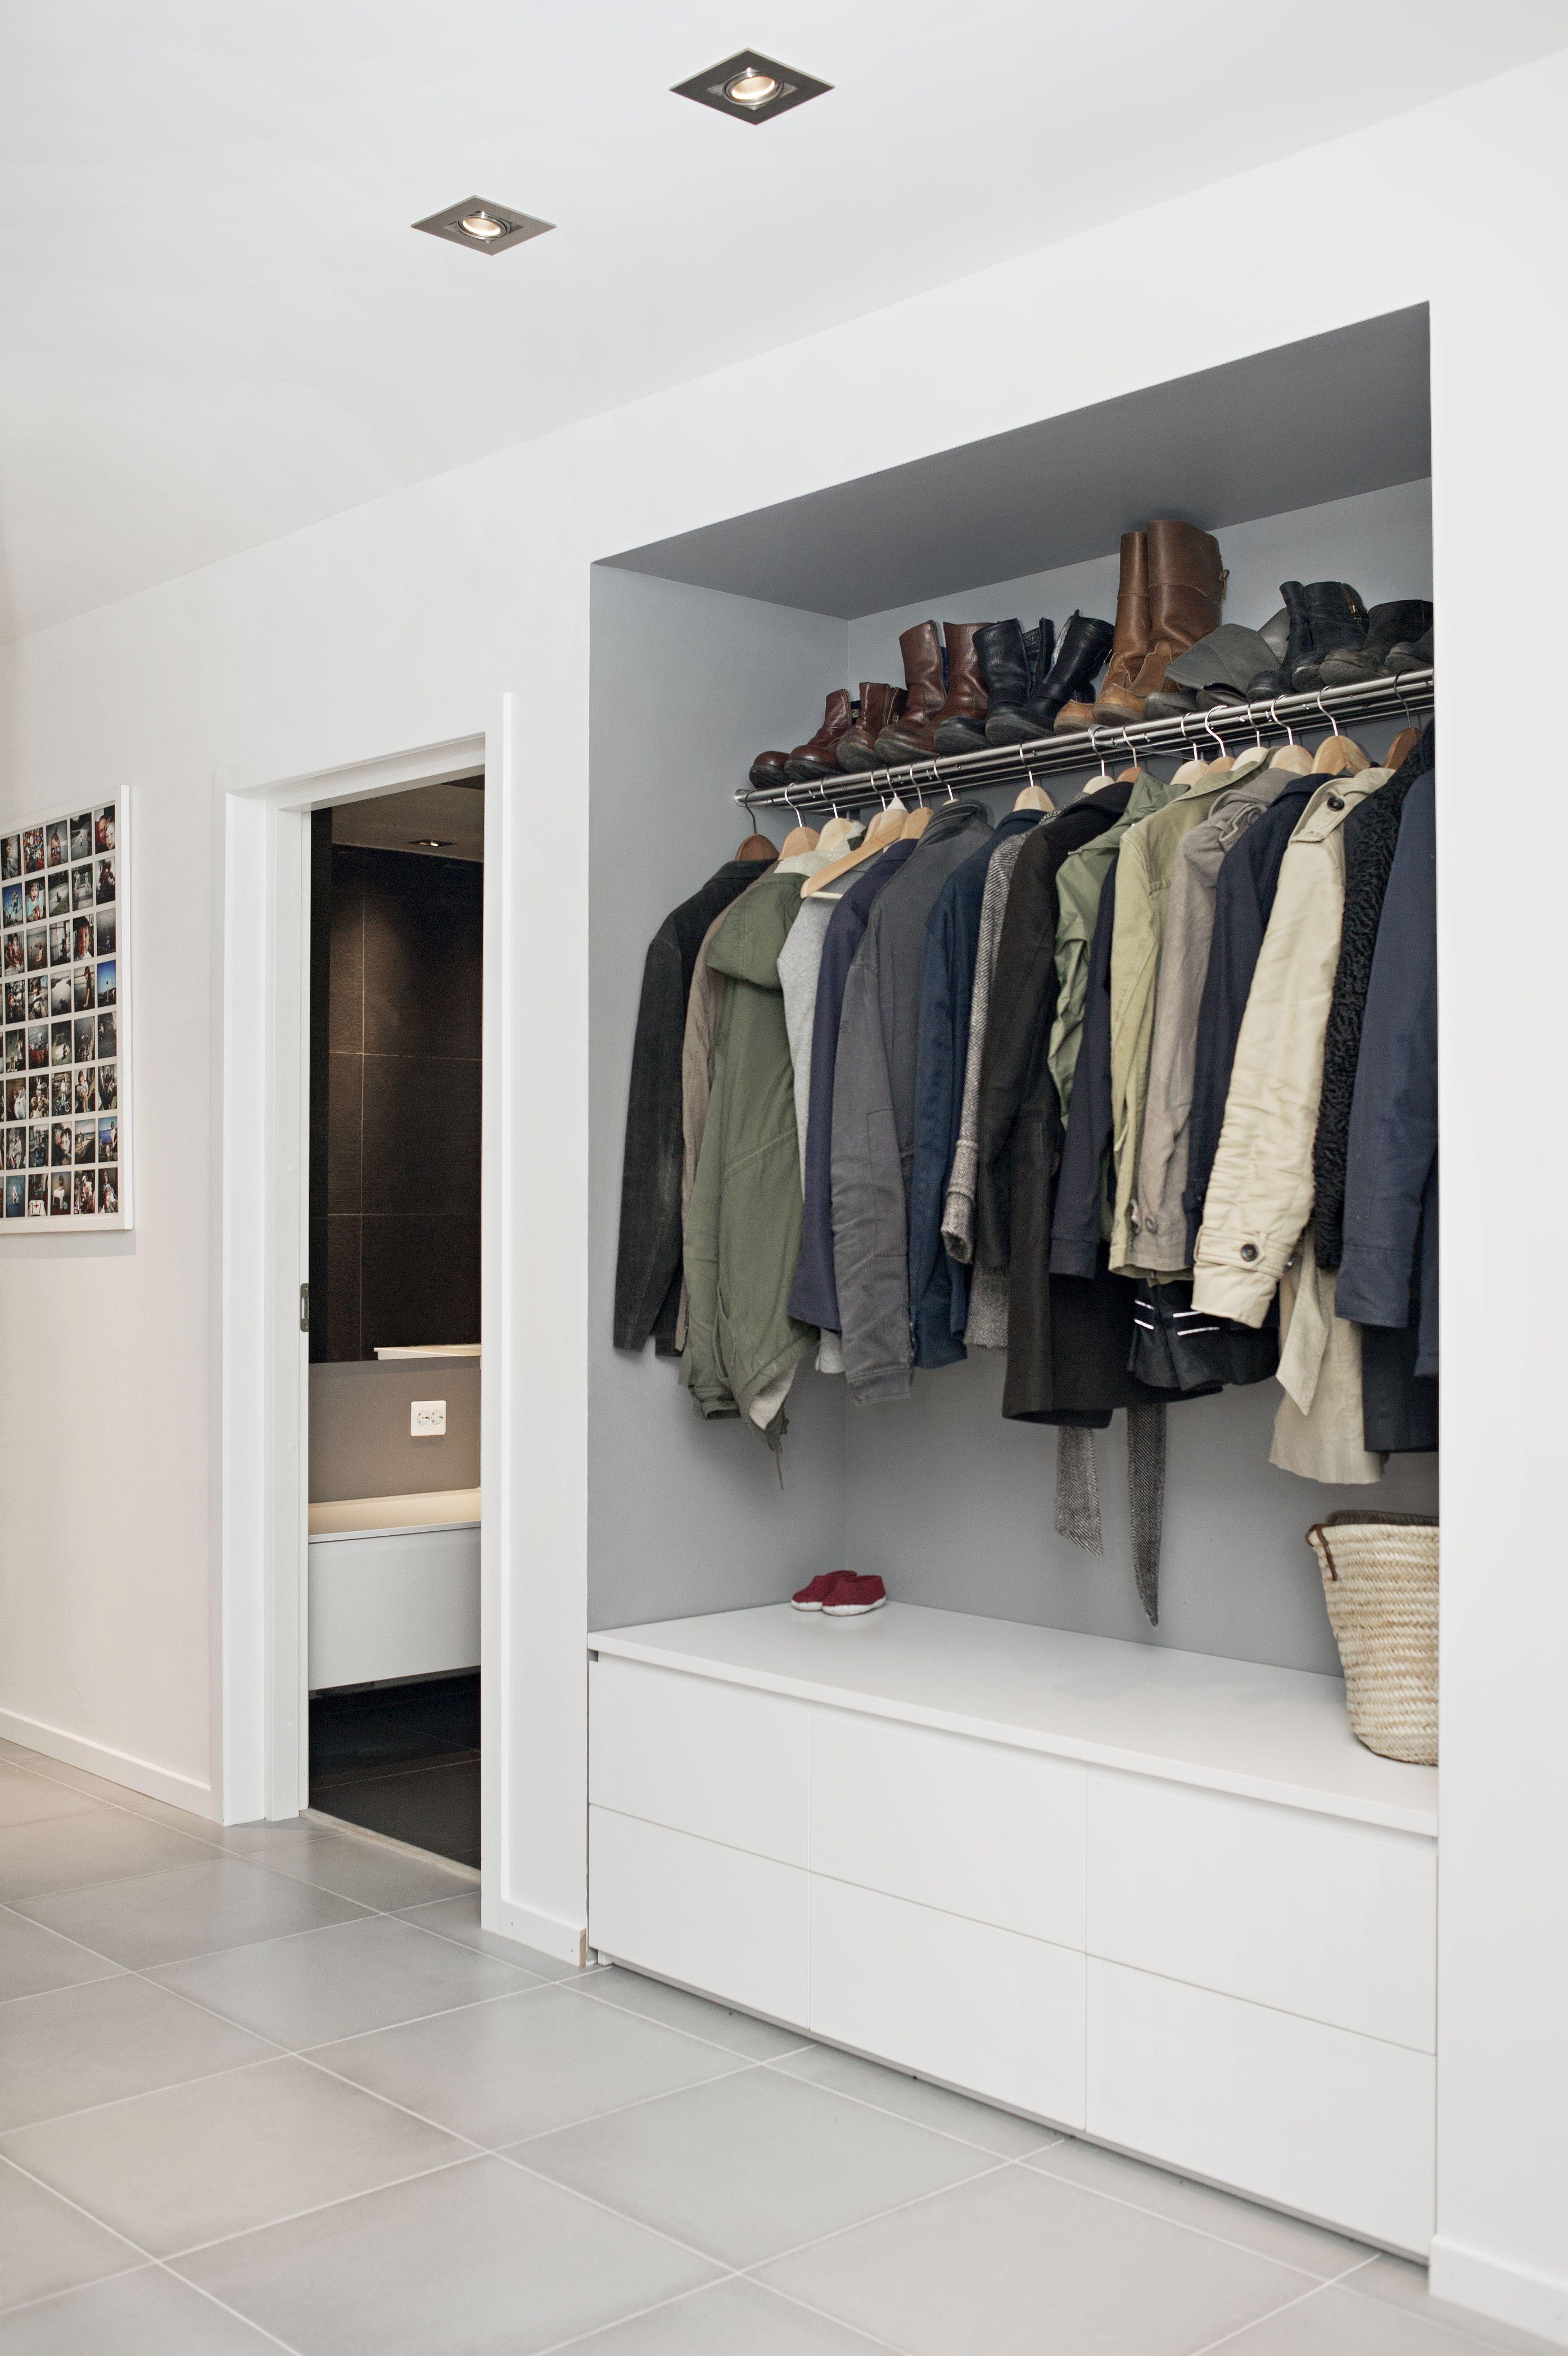 garderobe idee clever smart pinterest garderobe ideen garderoben und flure. Black Bedroom Furniture Sets. Home Design Ideas